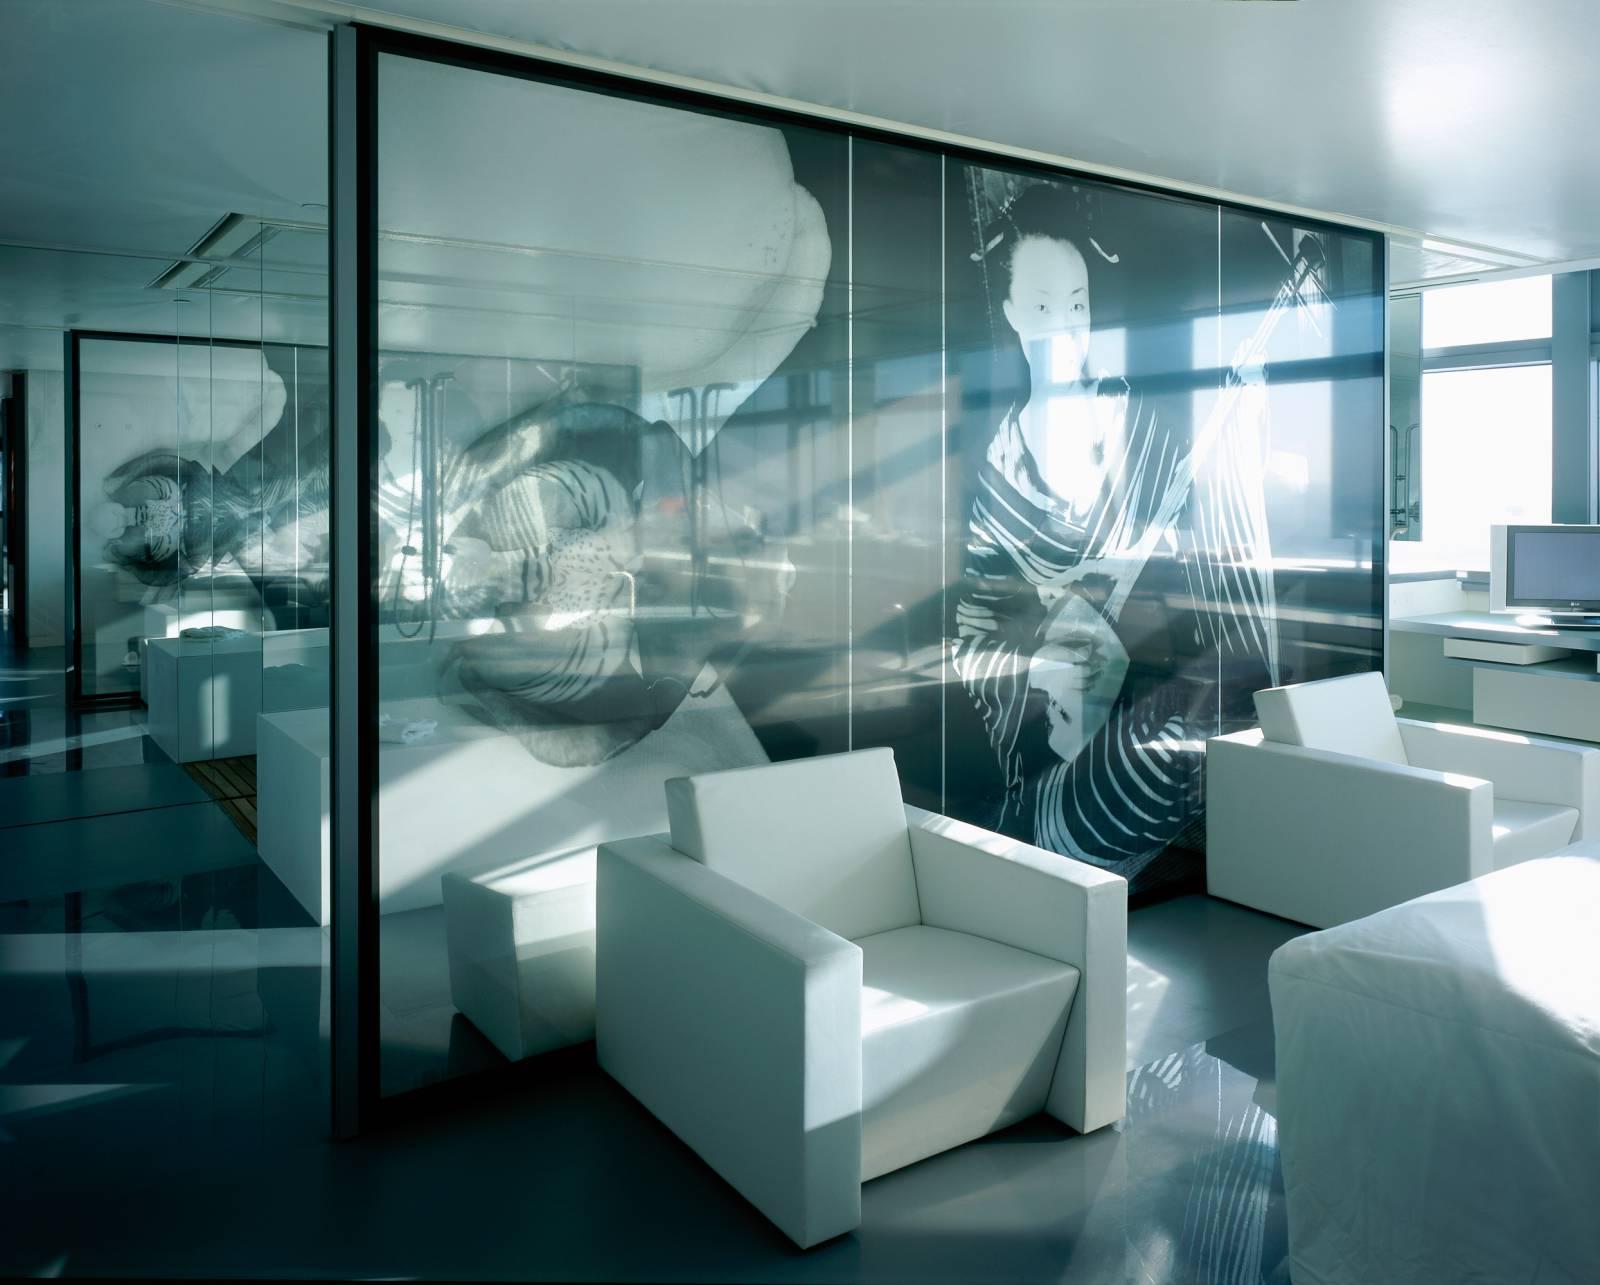 Puerta America Hotel — Ateliers Jean Nouvel